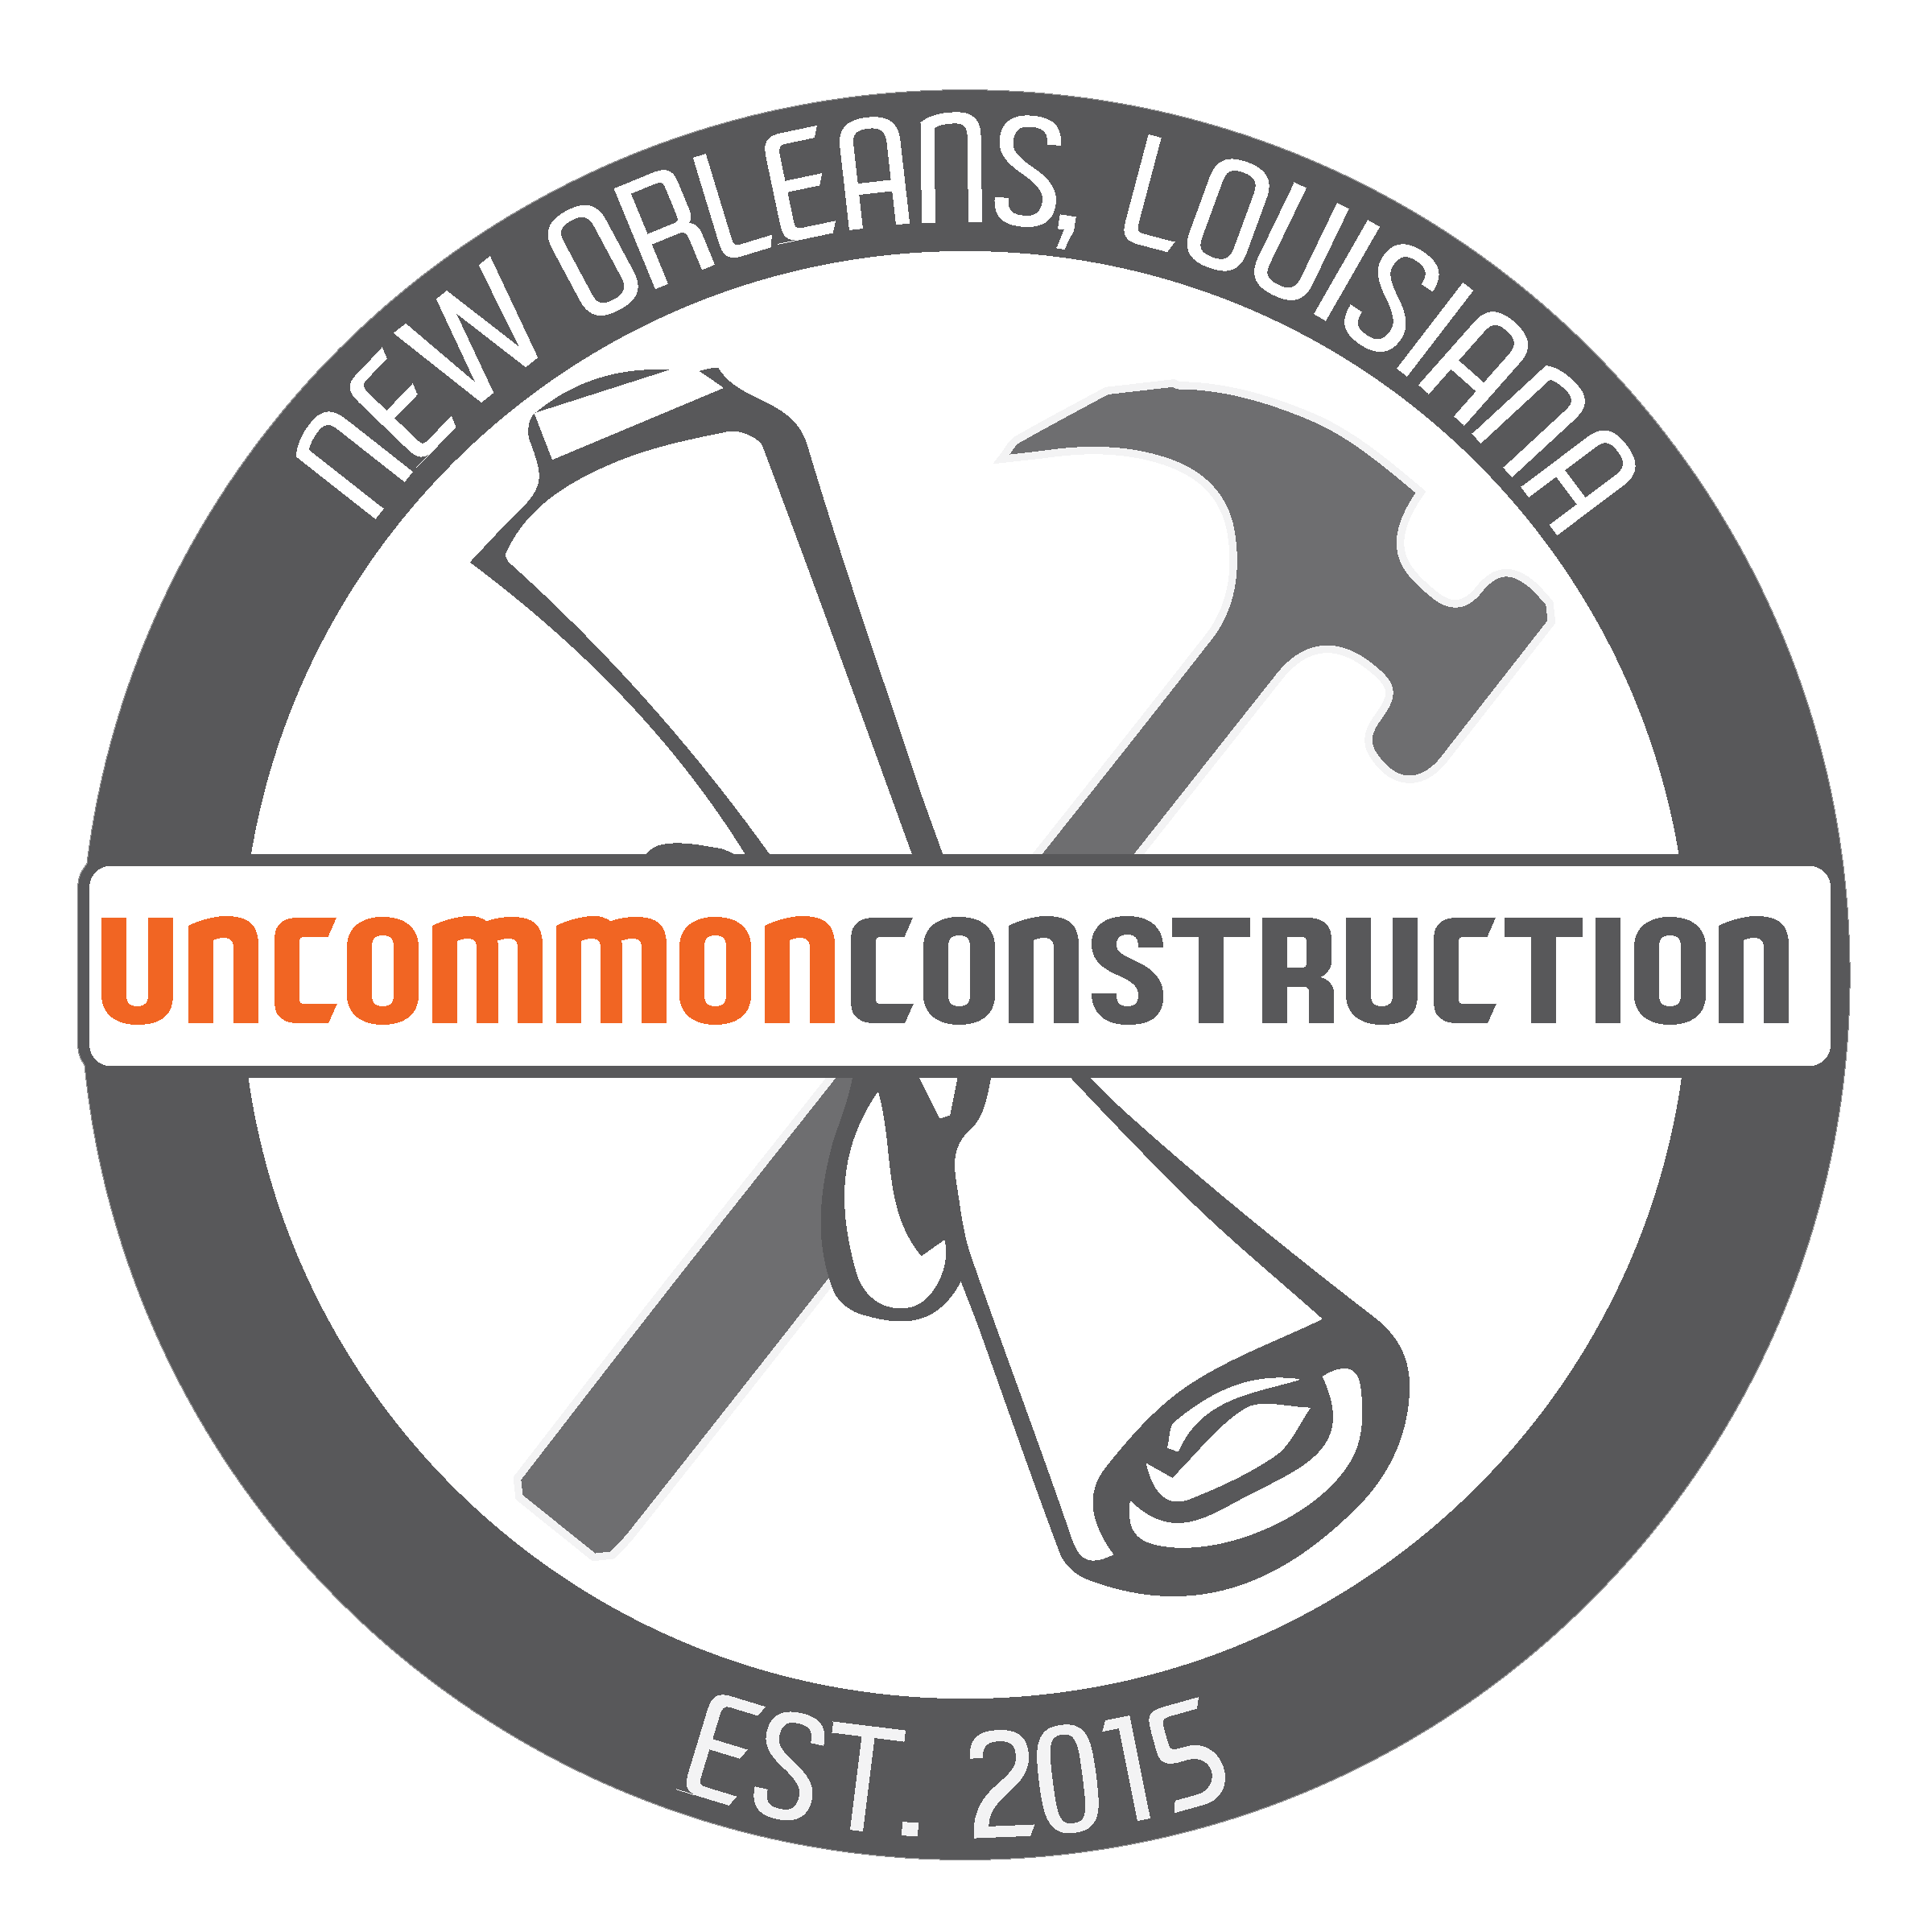 unCommon Construction - PO Box 791438New Orleans, LA 70119E: info@unCommonConstruction.org